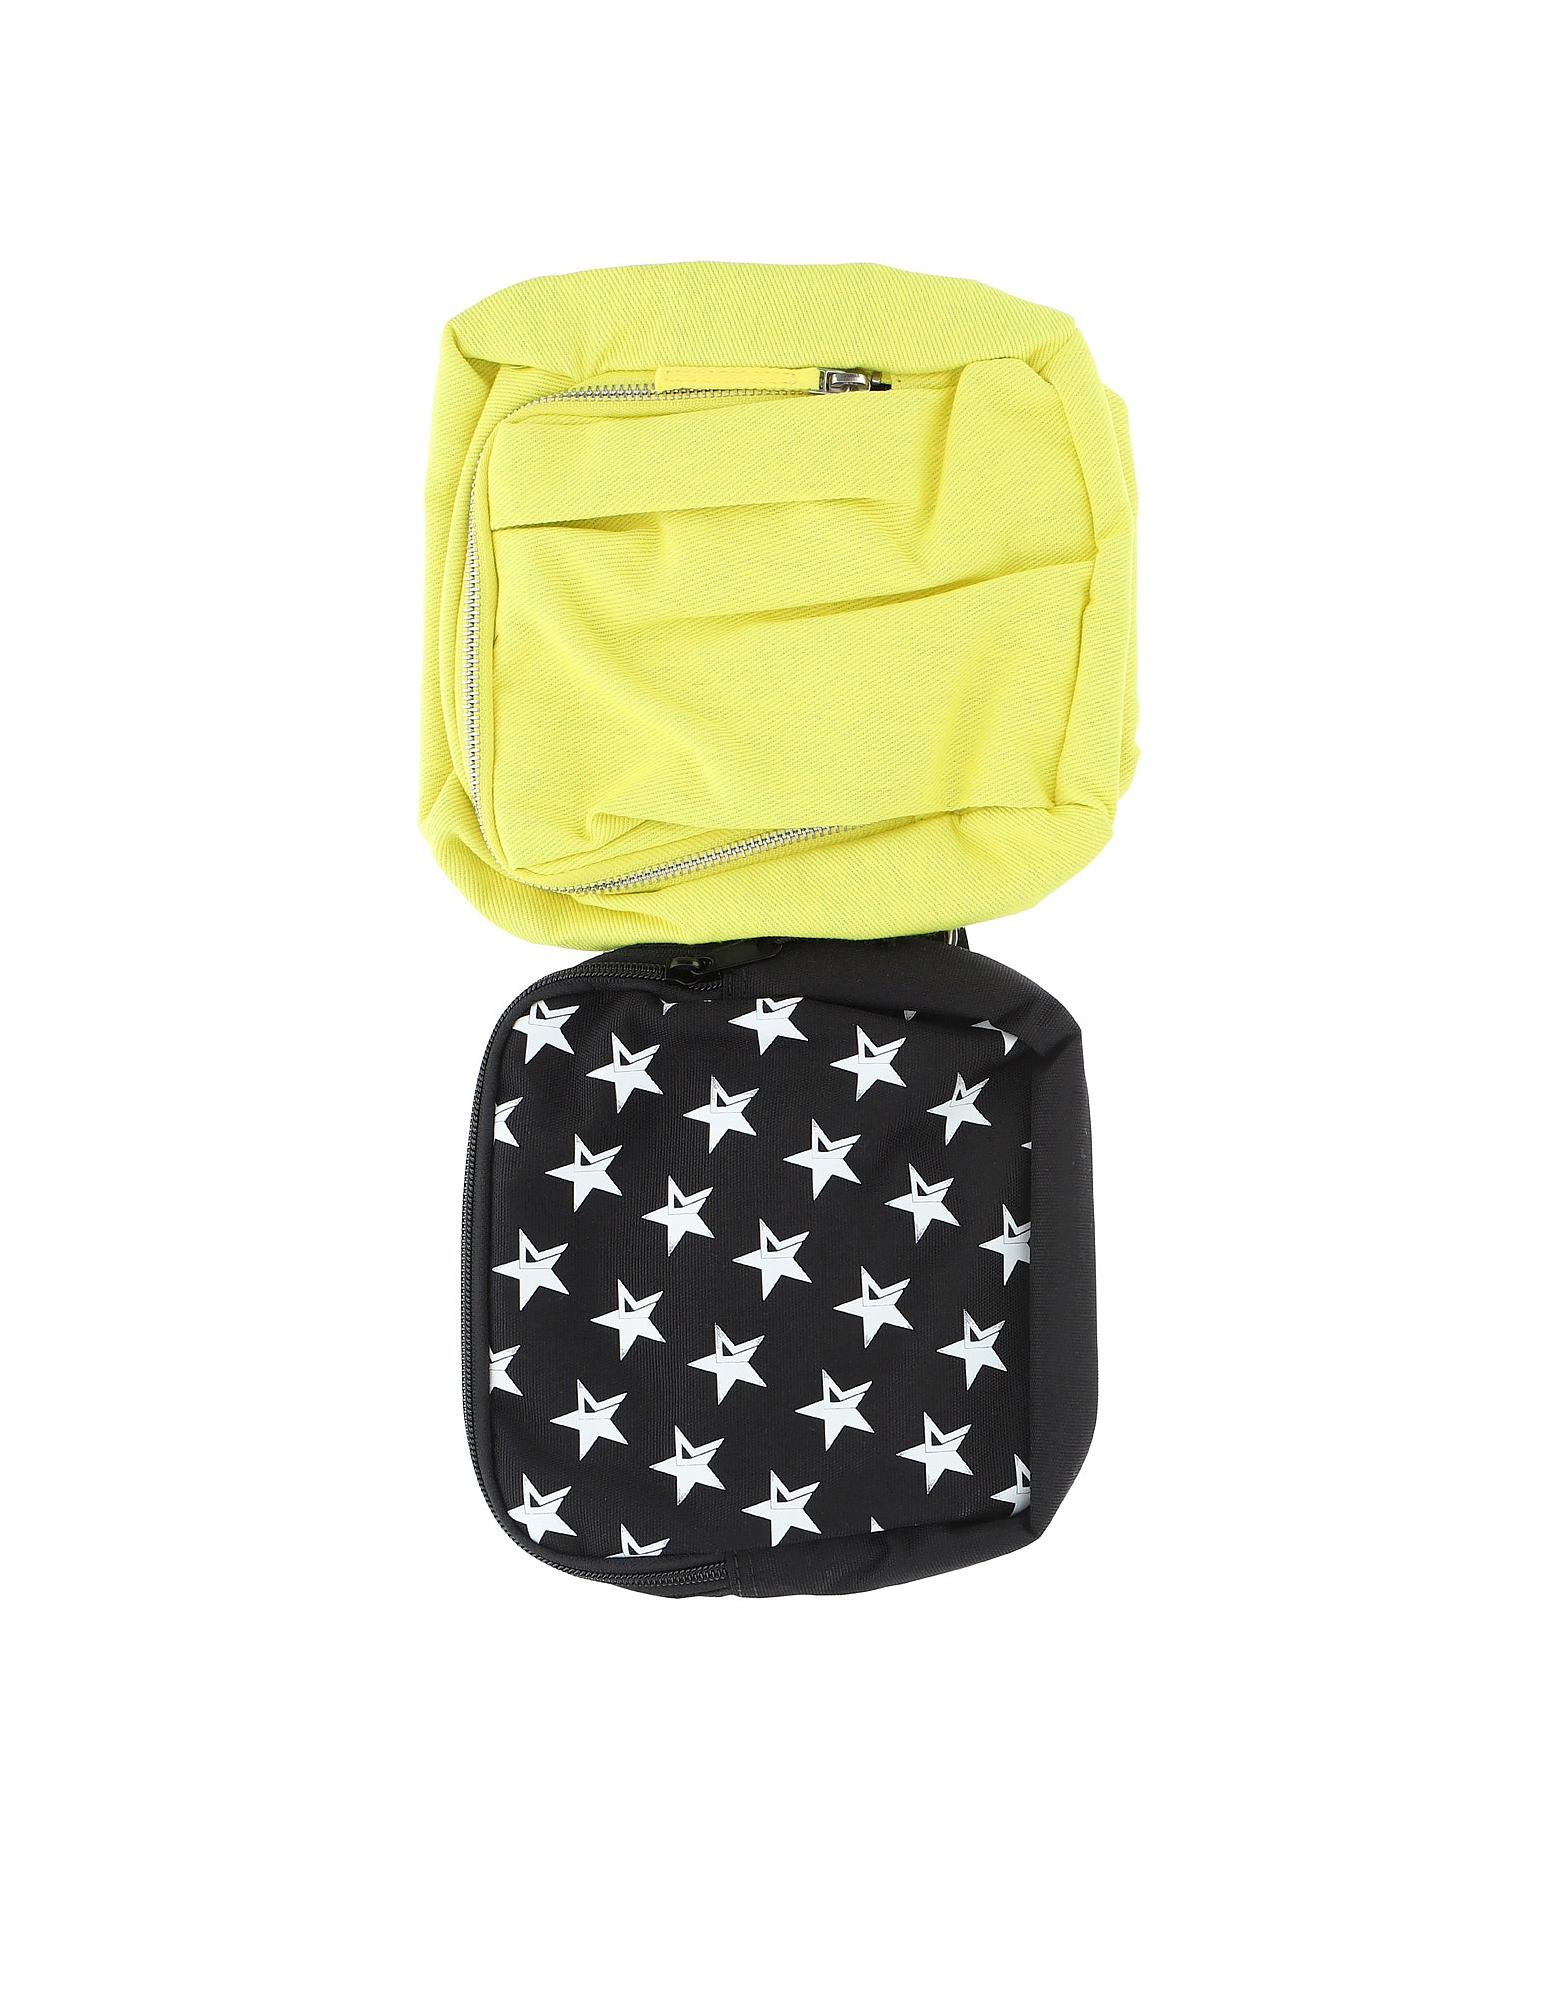 Raf Simons Designer Men's Bags, Raf Simons X Eastpak Double-pouch Belt Bag